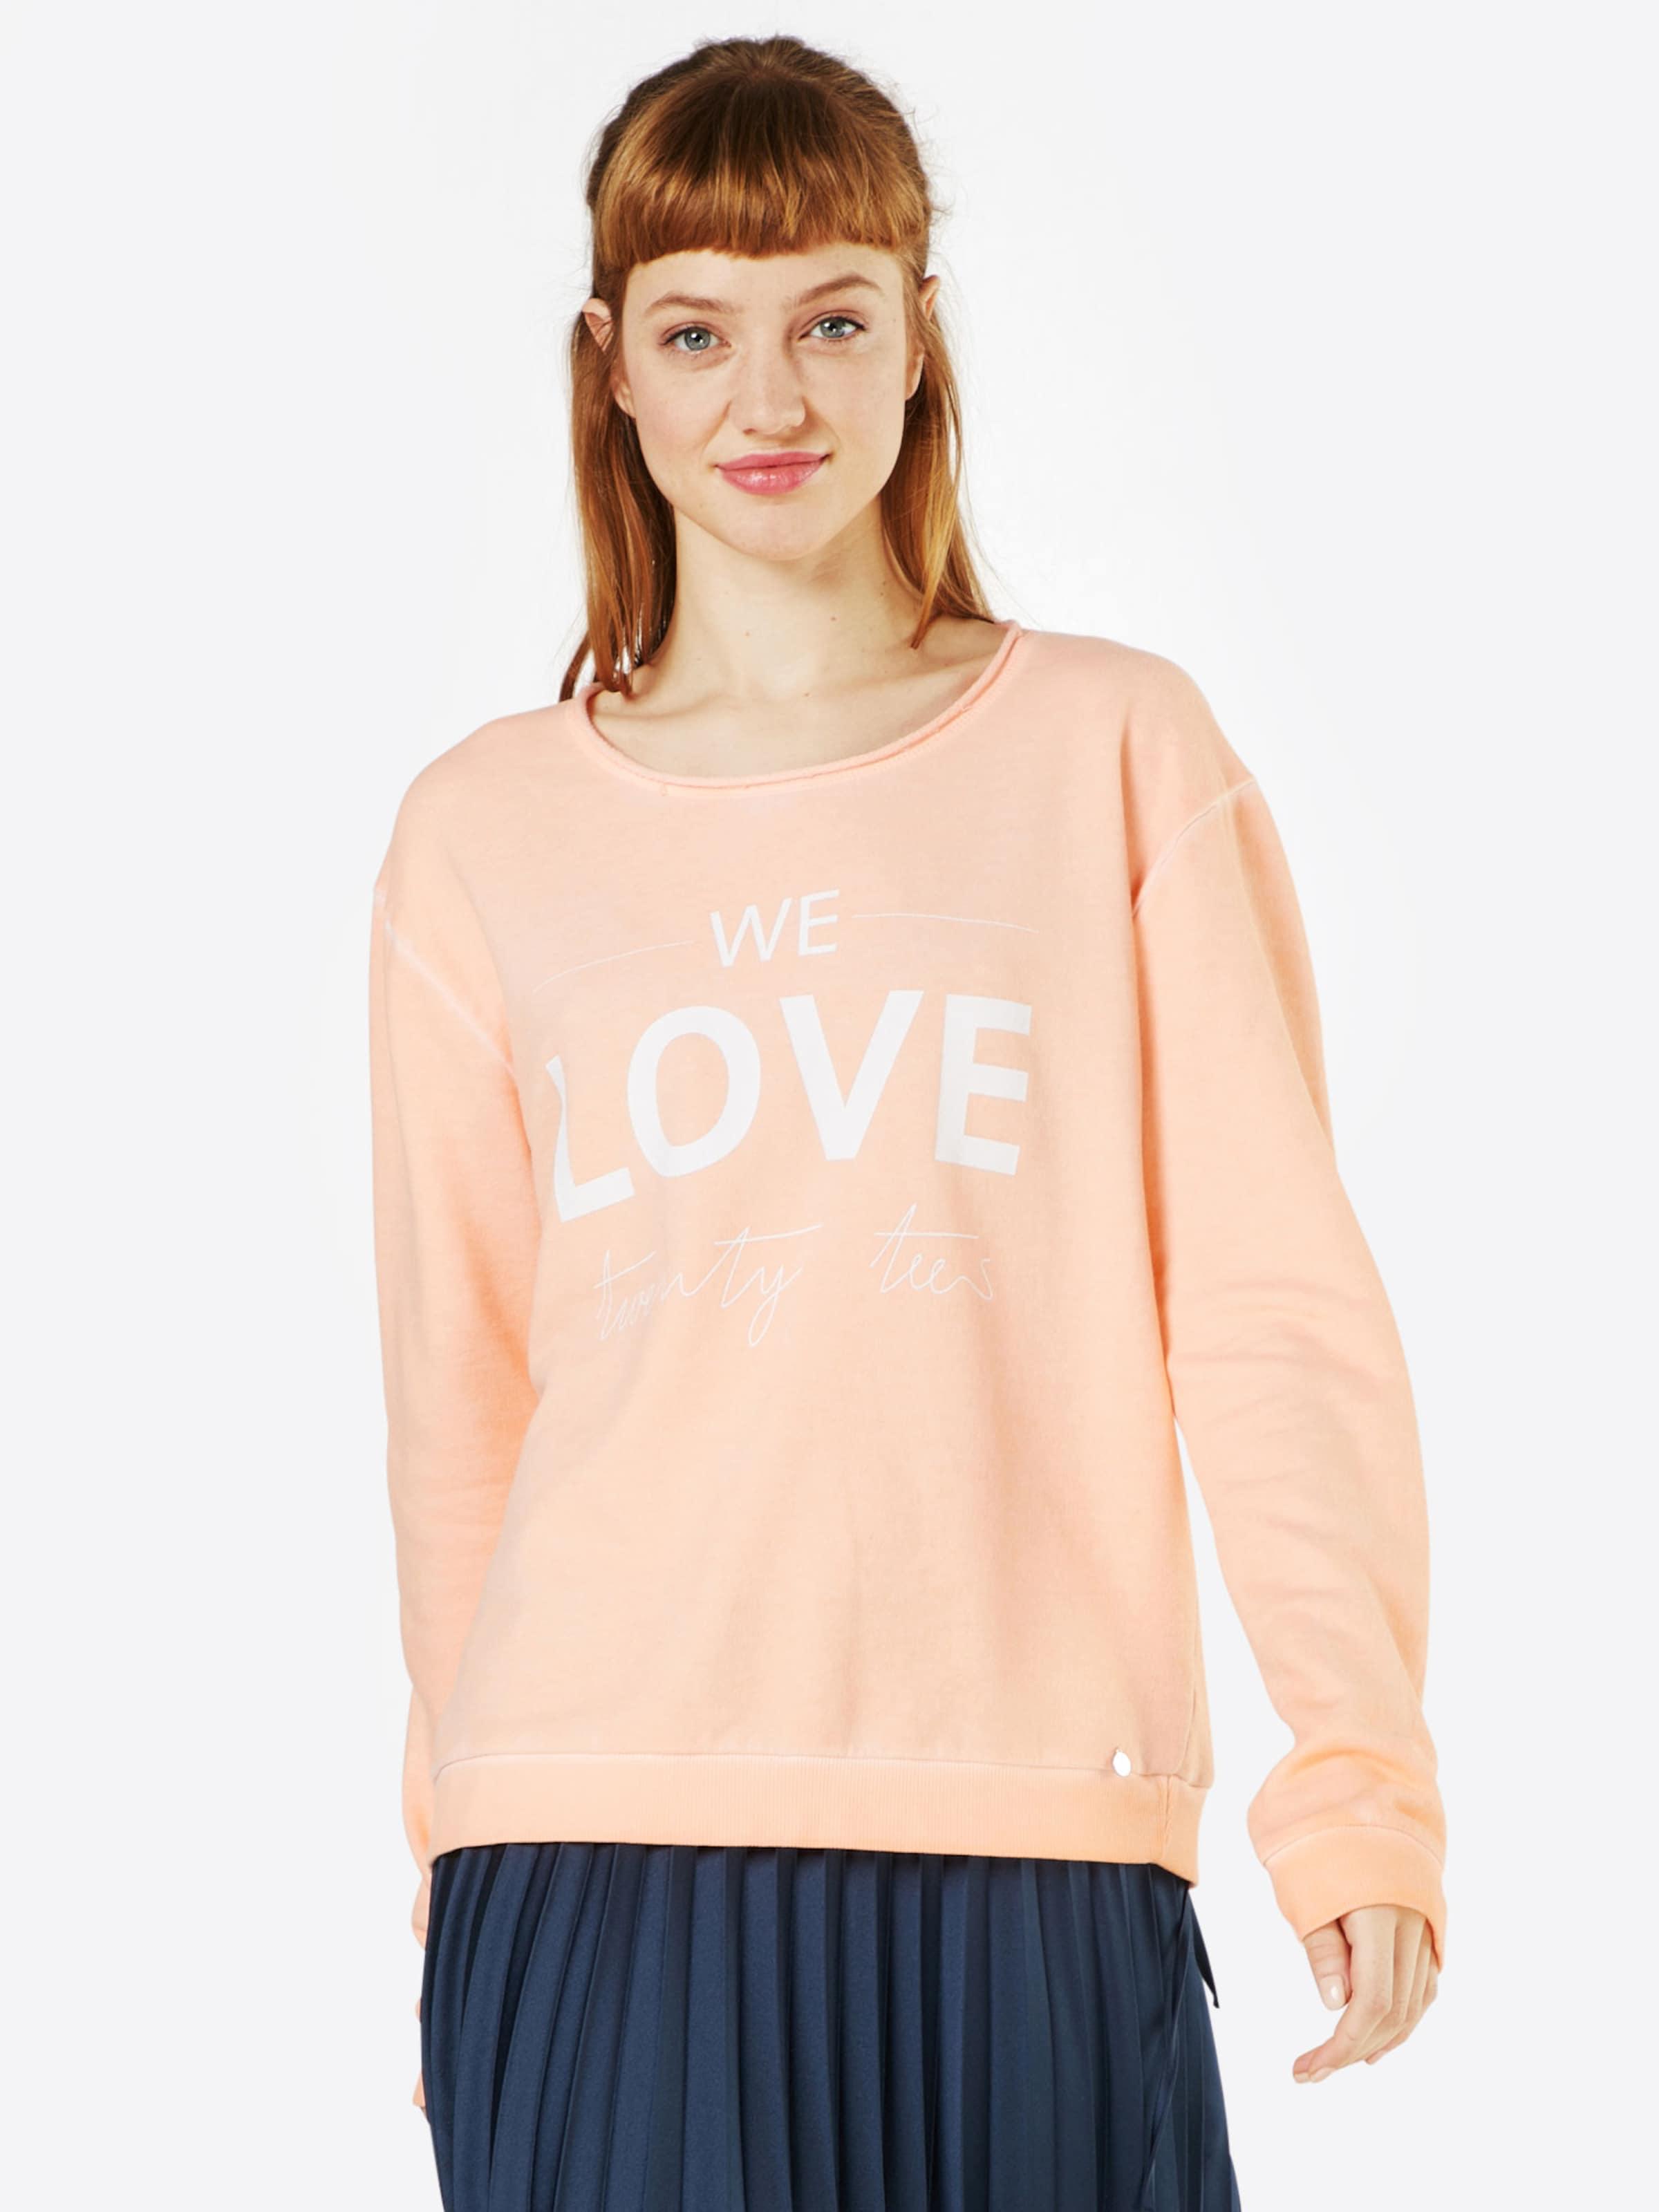 Auslass Nicekicks Günstig Kaufen Modisch twenty tees Sweatshirt 'We love' D2rNW7O1ai